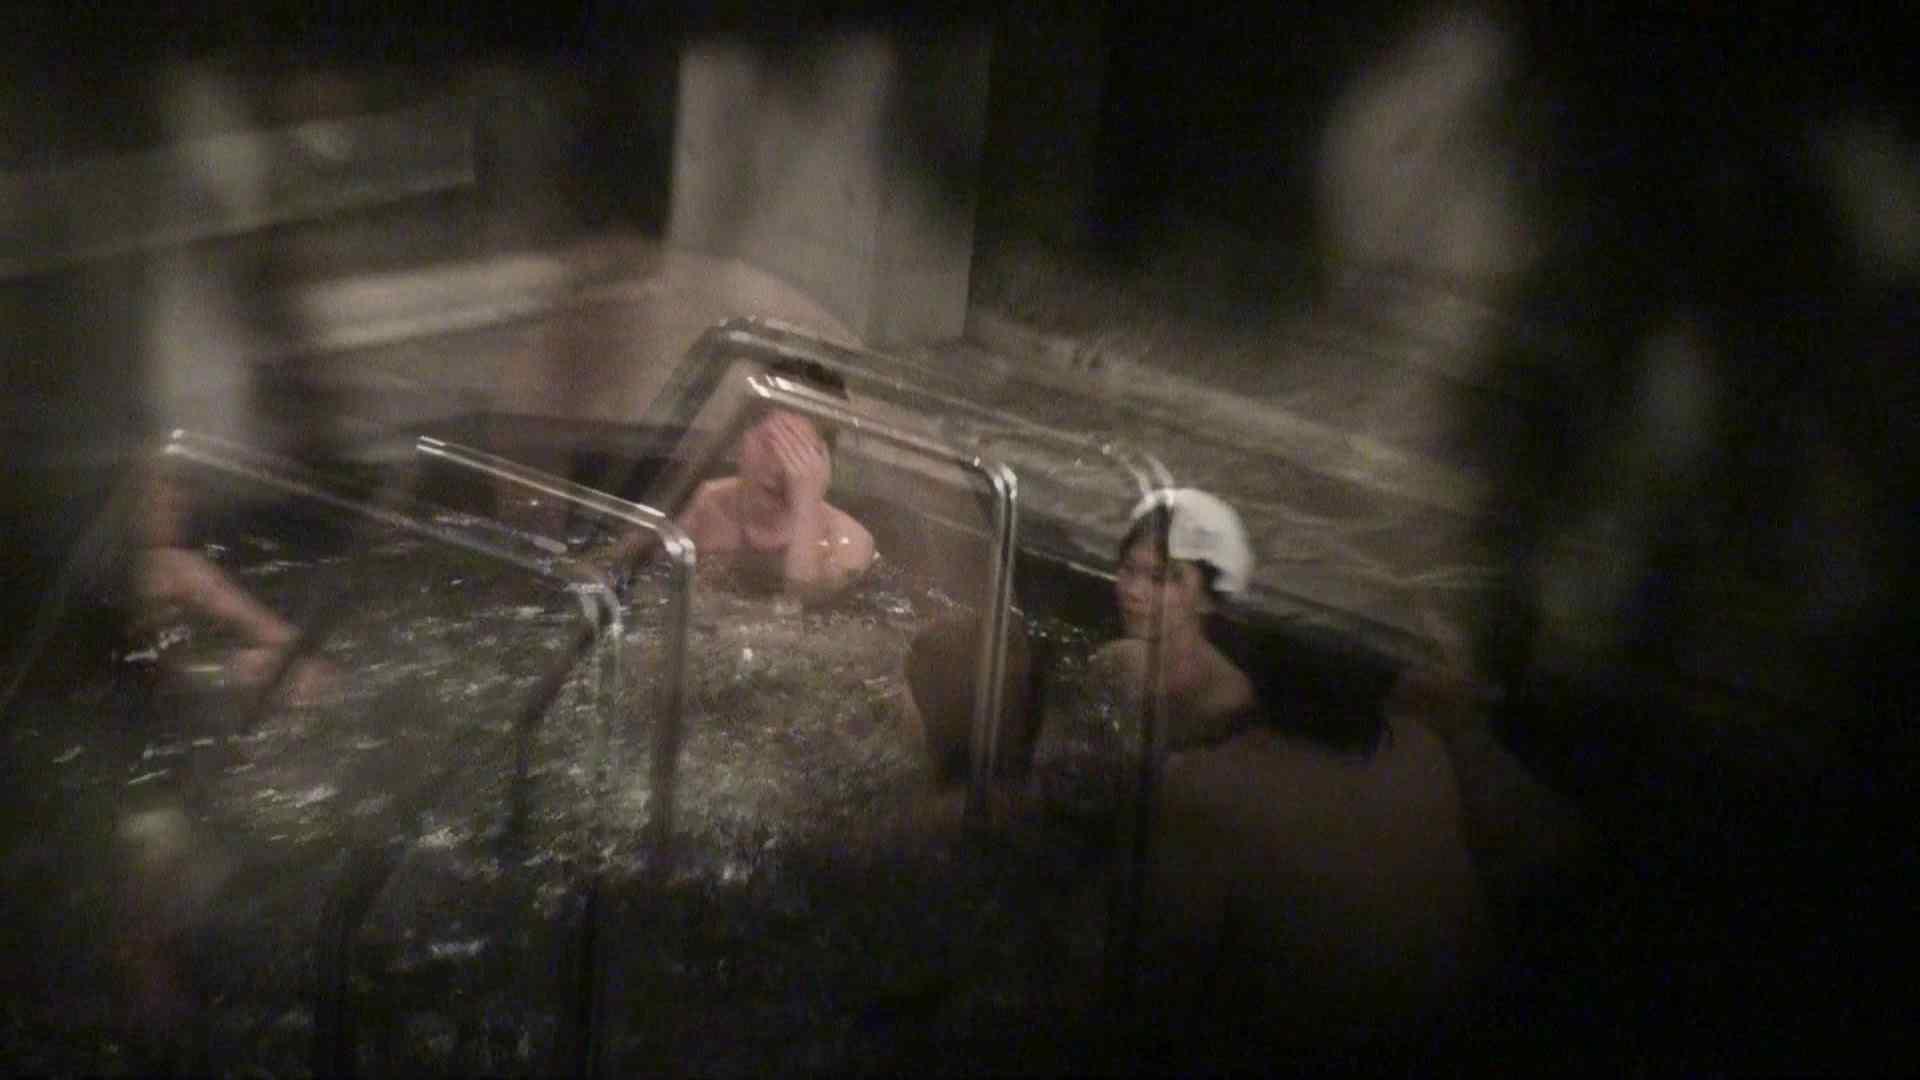 Aquaな露天風呂Vol.419 露天 覗きおまんこ画像 99画像 47